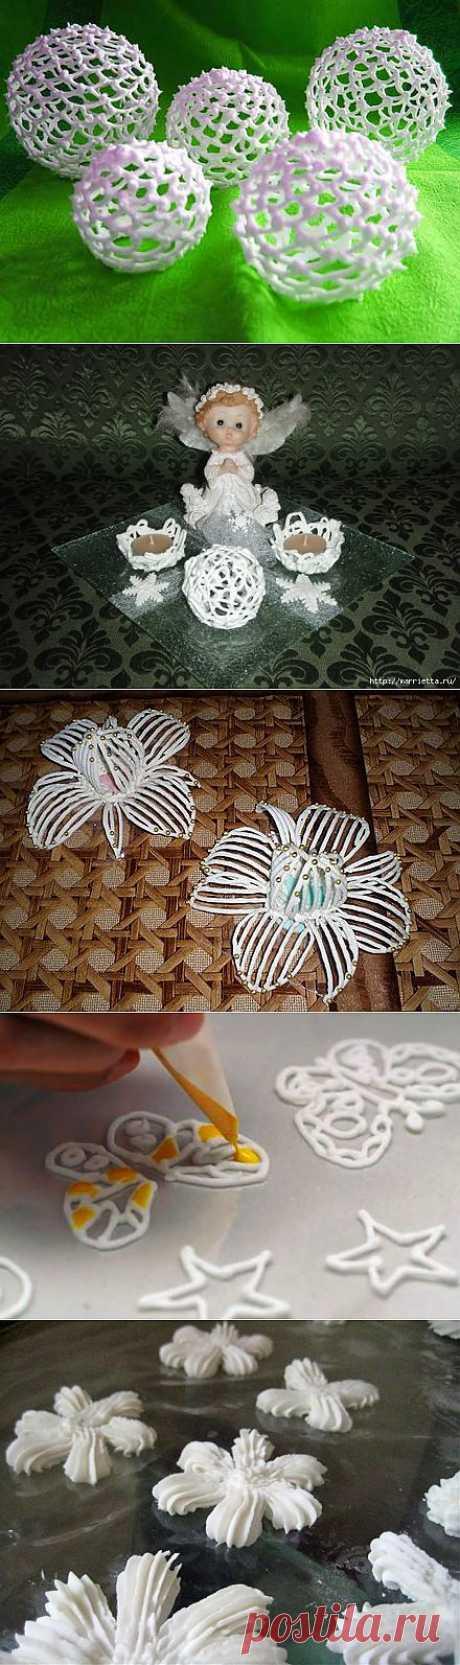 Айсинг: сладкие ажурные шары. Мастер-классы | Домохозяйка